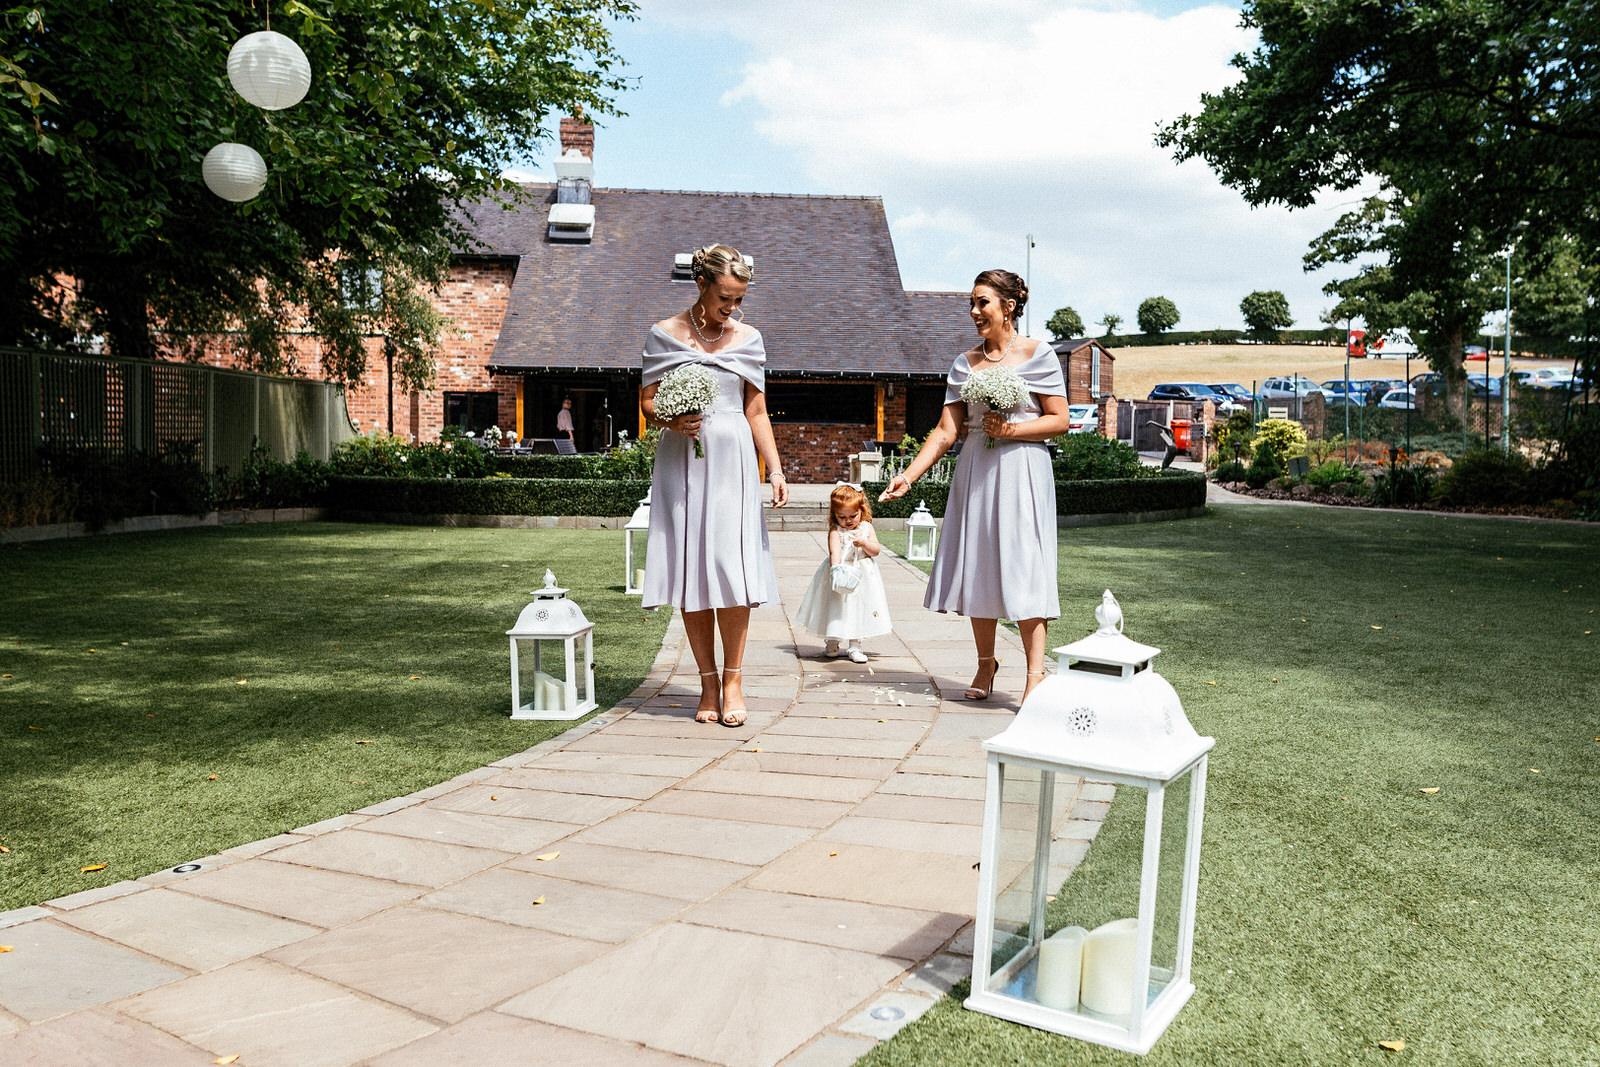 Moddershall-Oaks-Spa-Wedding-Photographer-017.jpg